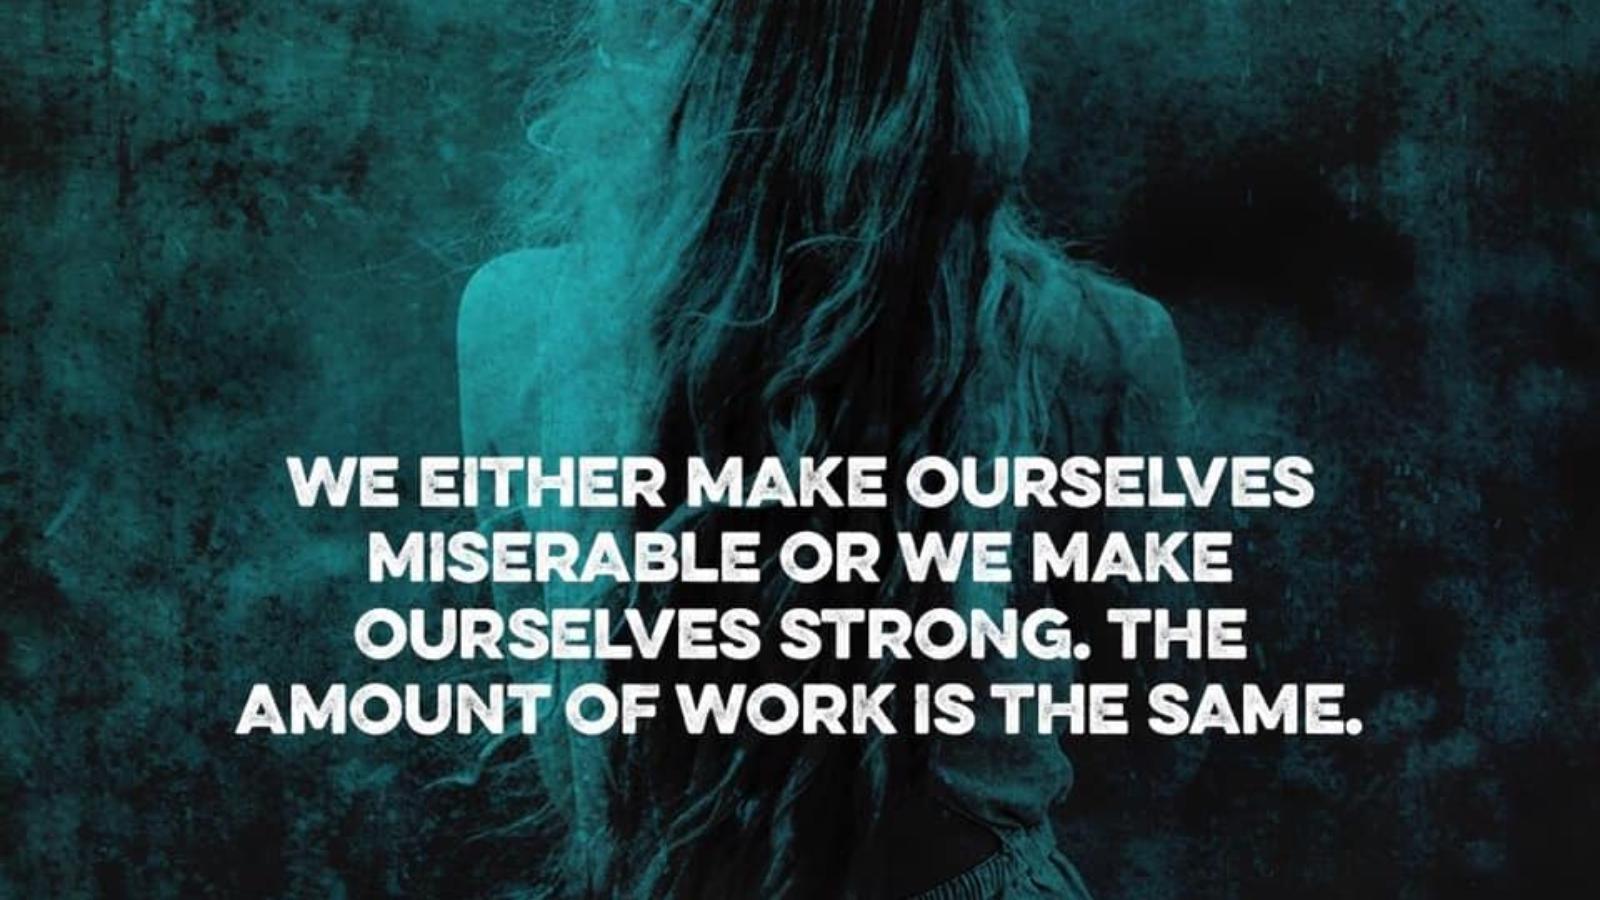 make oursevles miserable